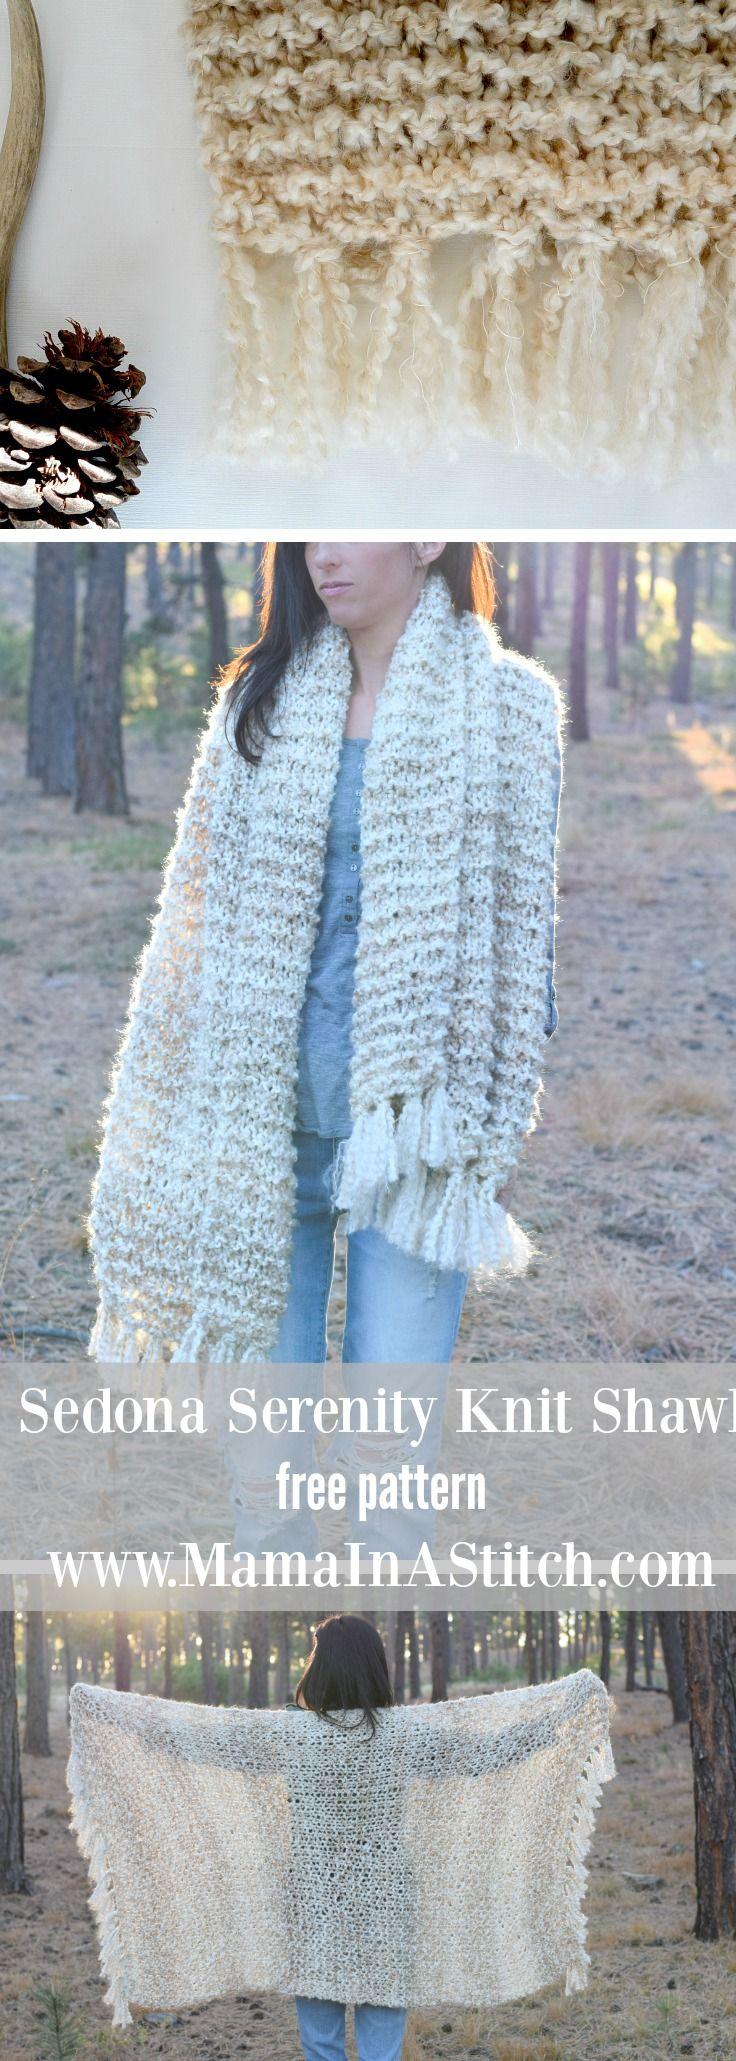 Sedona serenity knit shawl free knitting pattern via sedona serenity knit shawl free knitting pattern via mamainastitch this beginner friendly pattern works up bankloansurffo Gallery